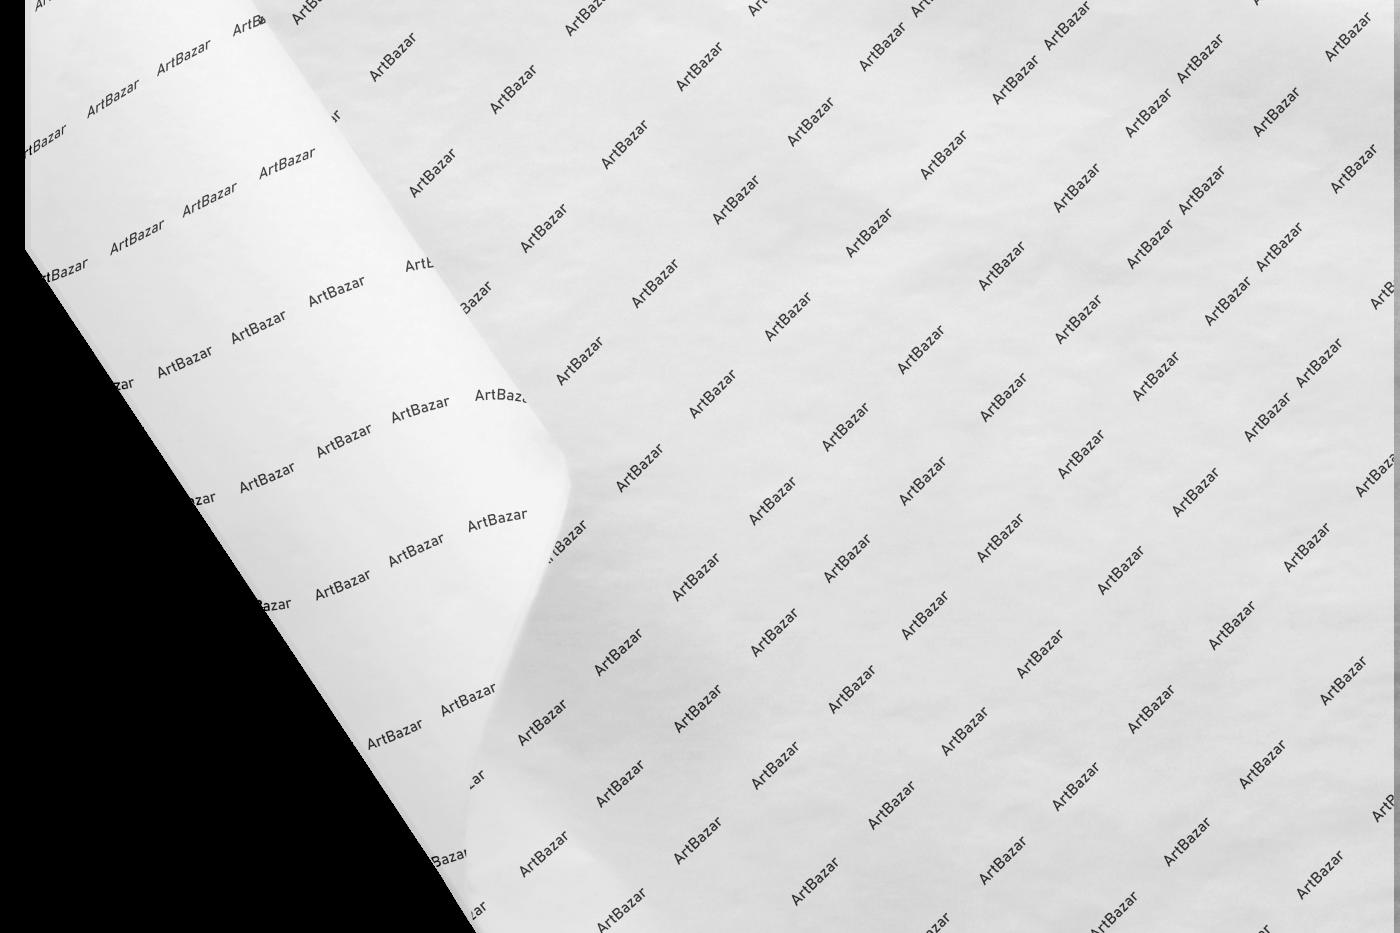 Coala de hartie printata la o culoare